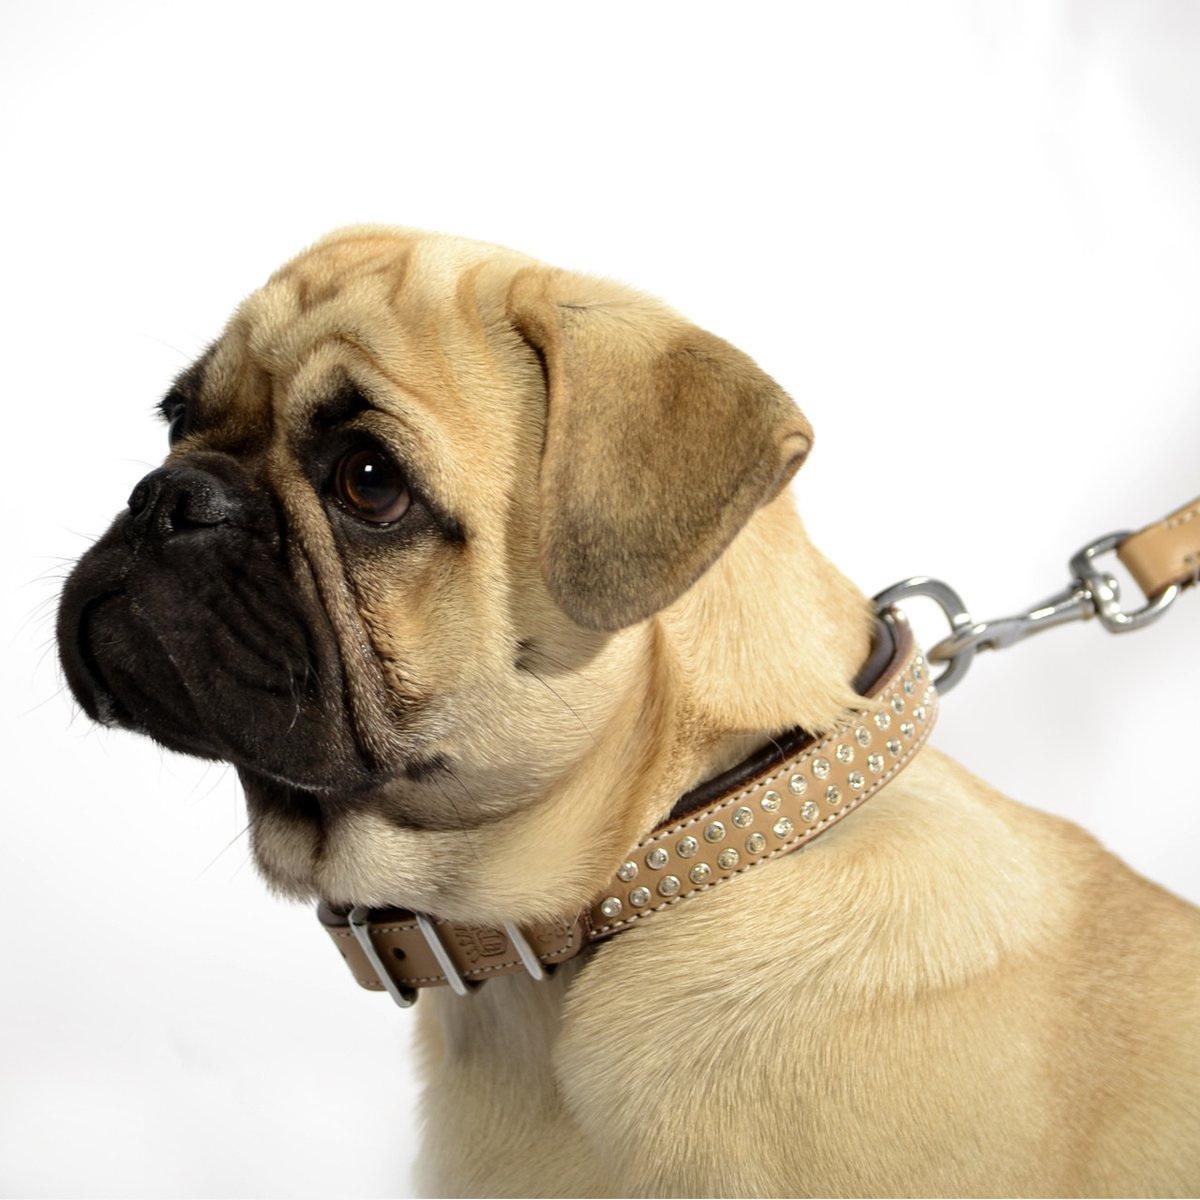 Tough Stuff Dog Collars